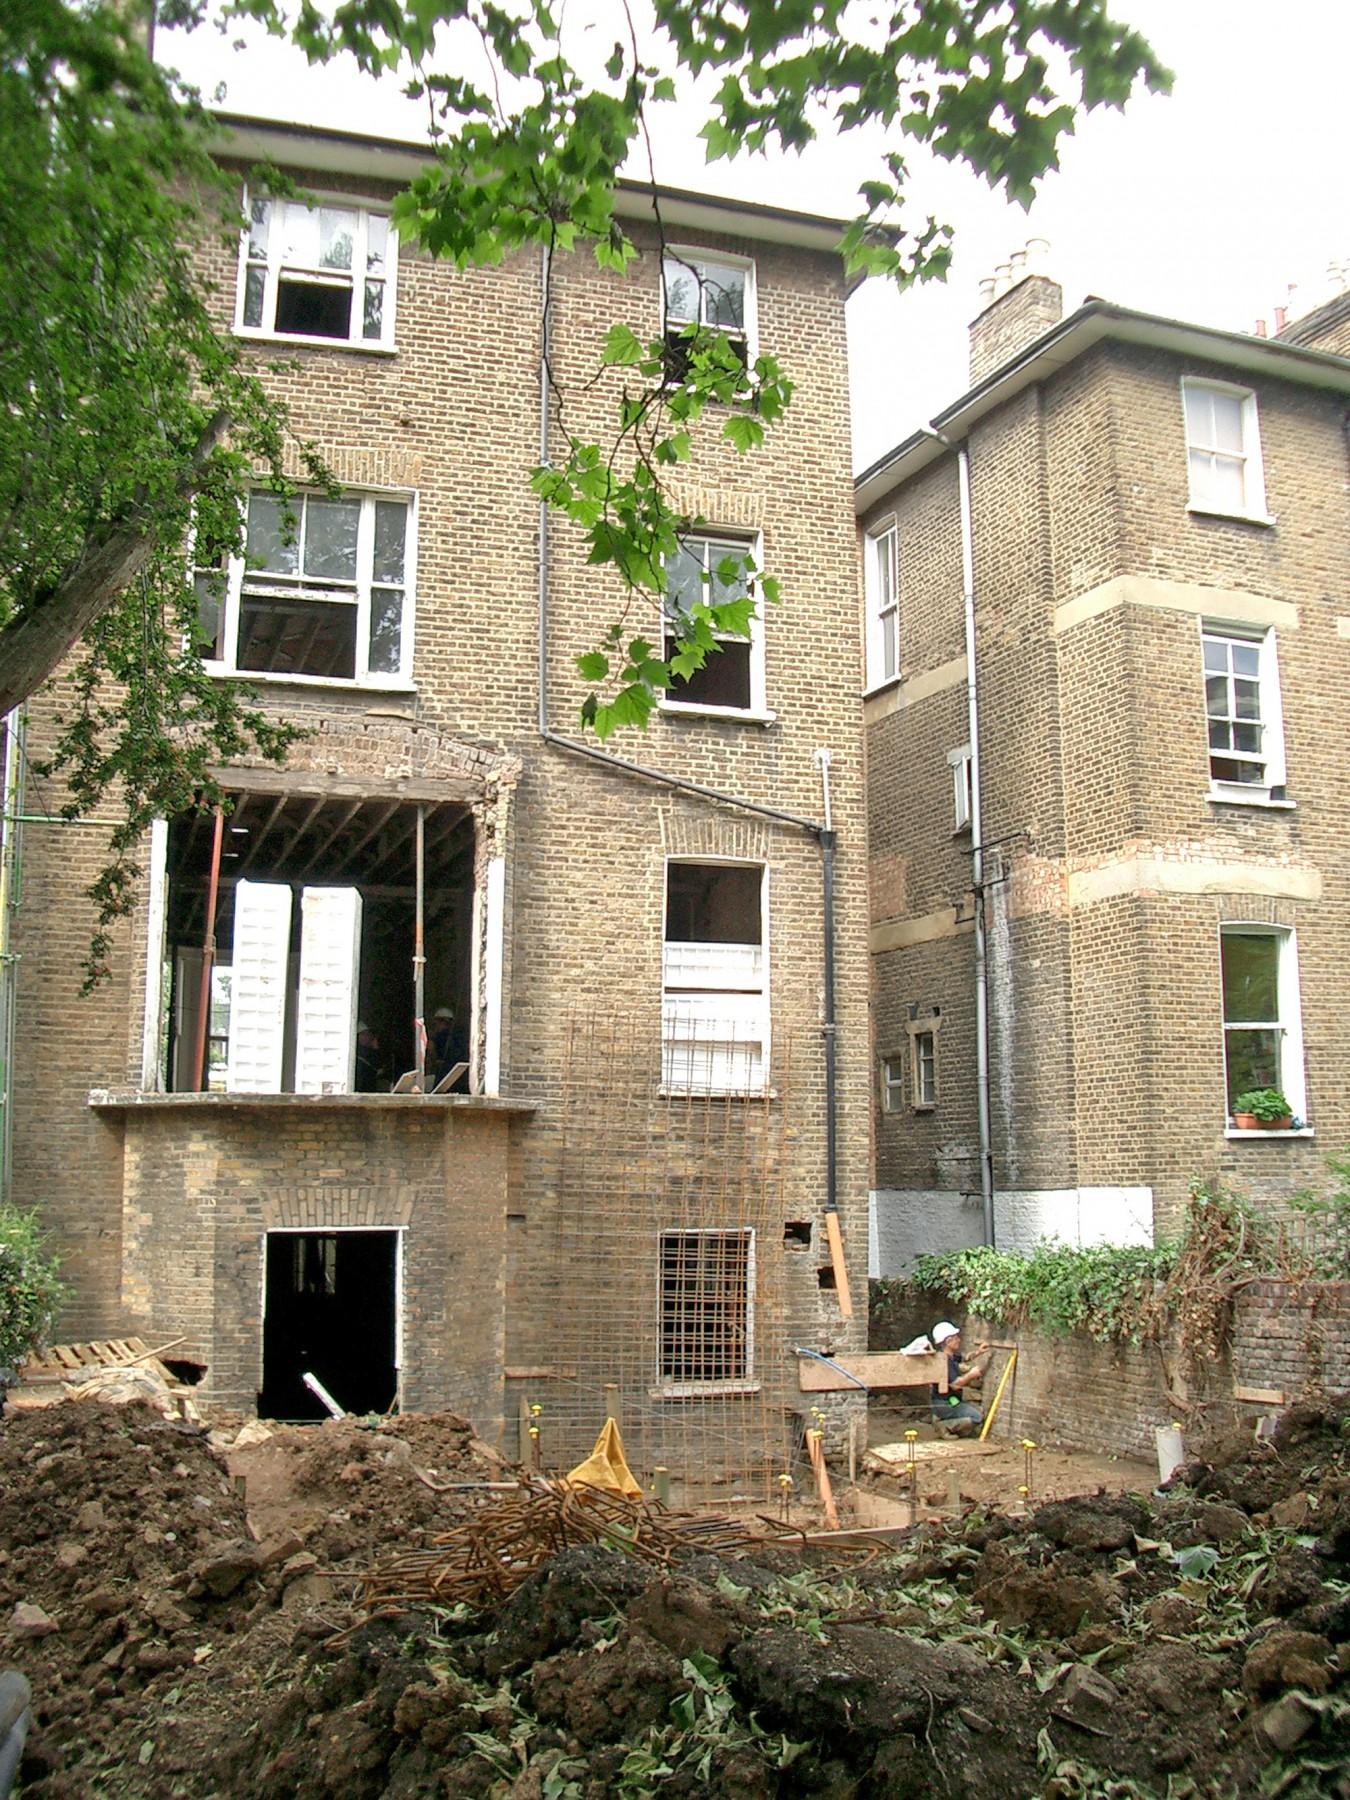 Kander-house-Primrose-hill-London-residential-home-contemporary-interior-Riba-award-victorian-Jamie-Fobert-Architects-construction-site-3